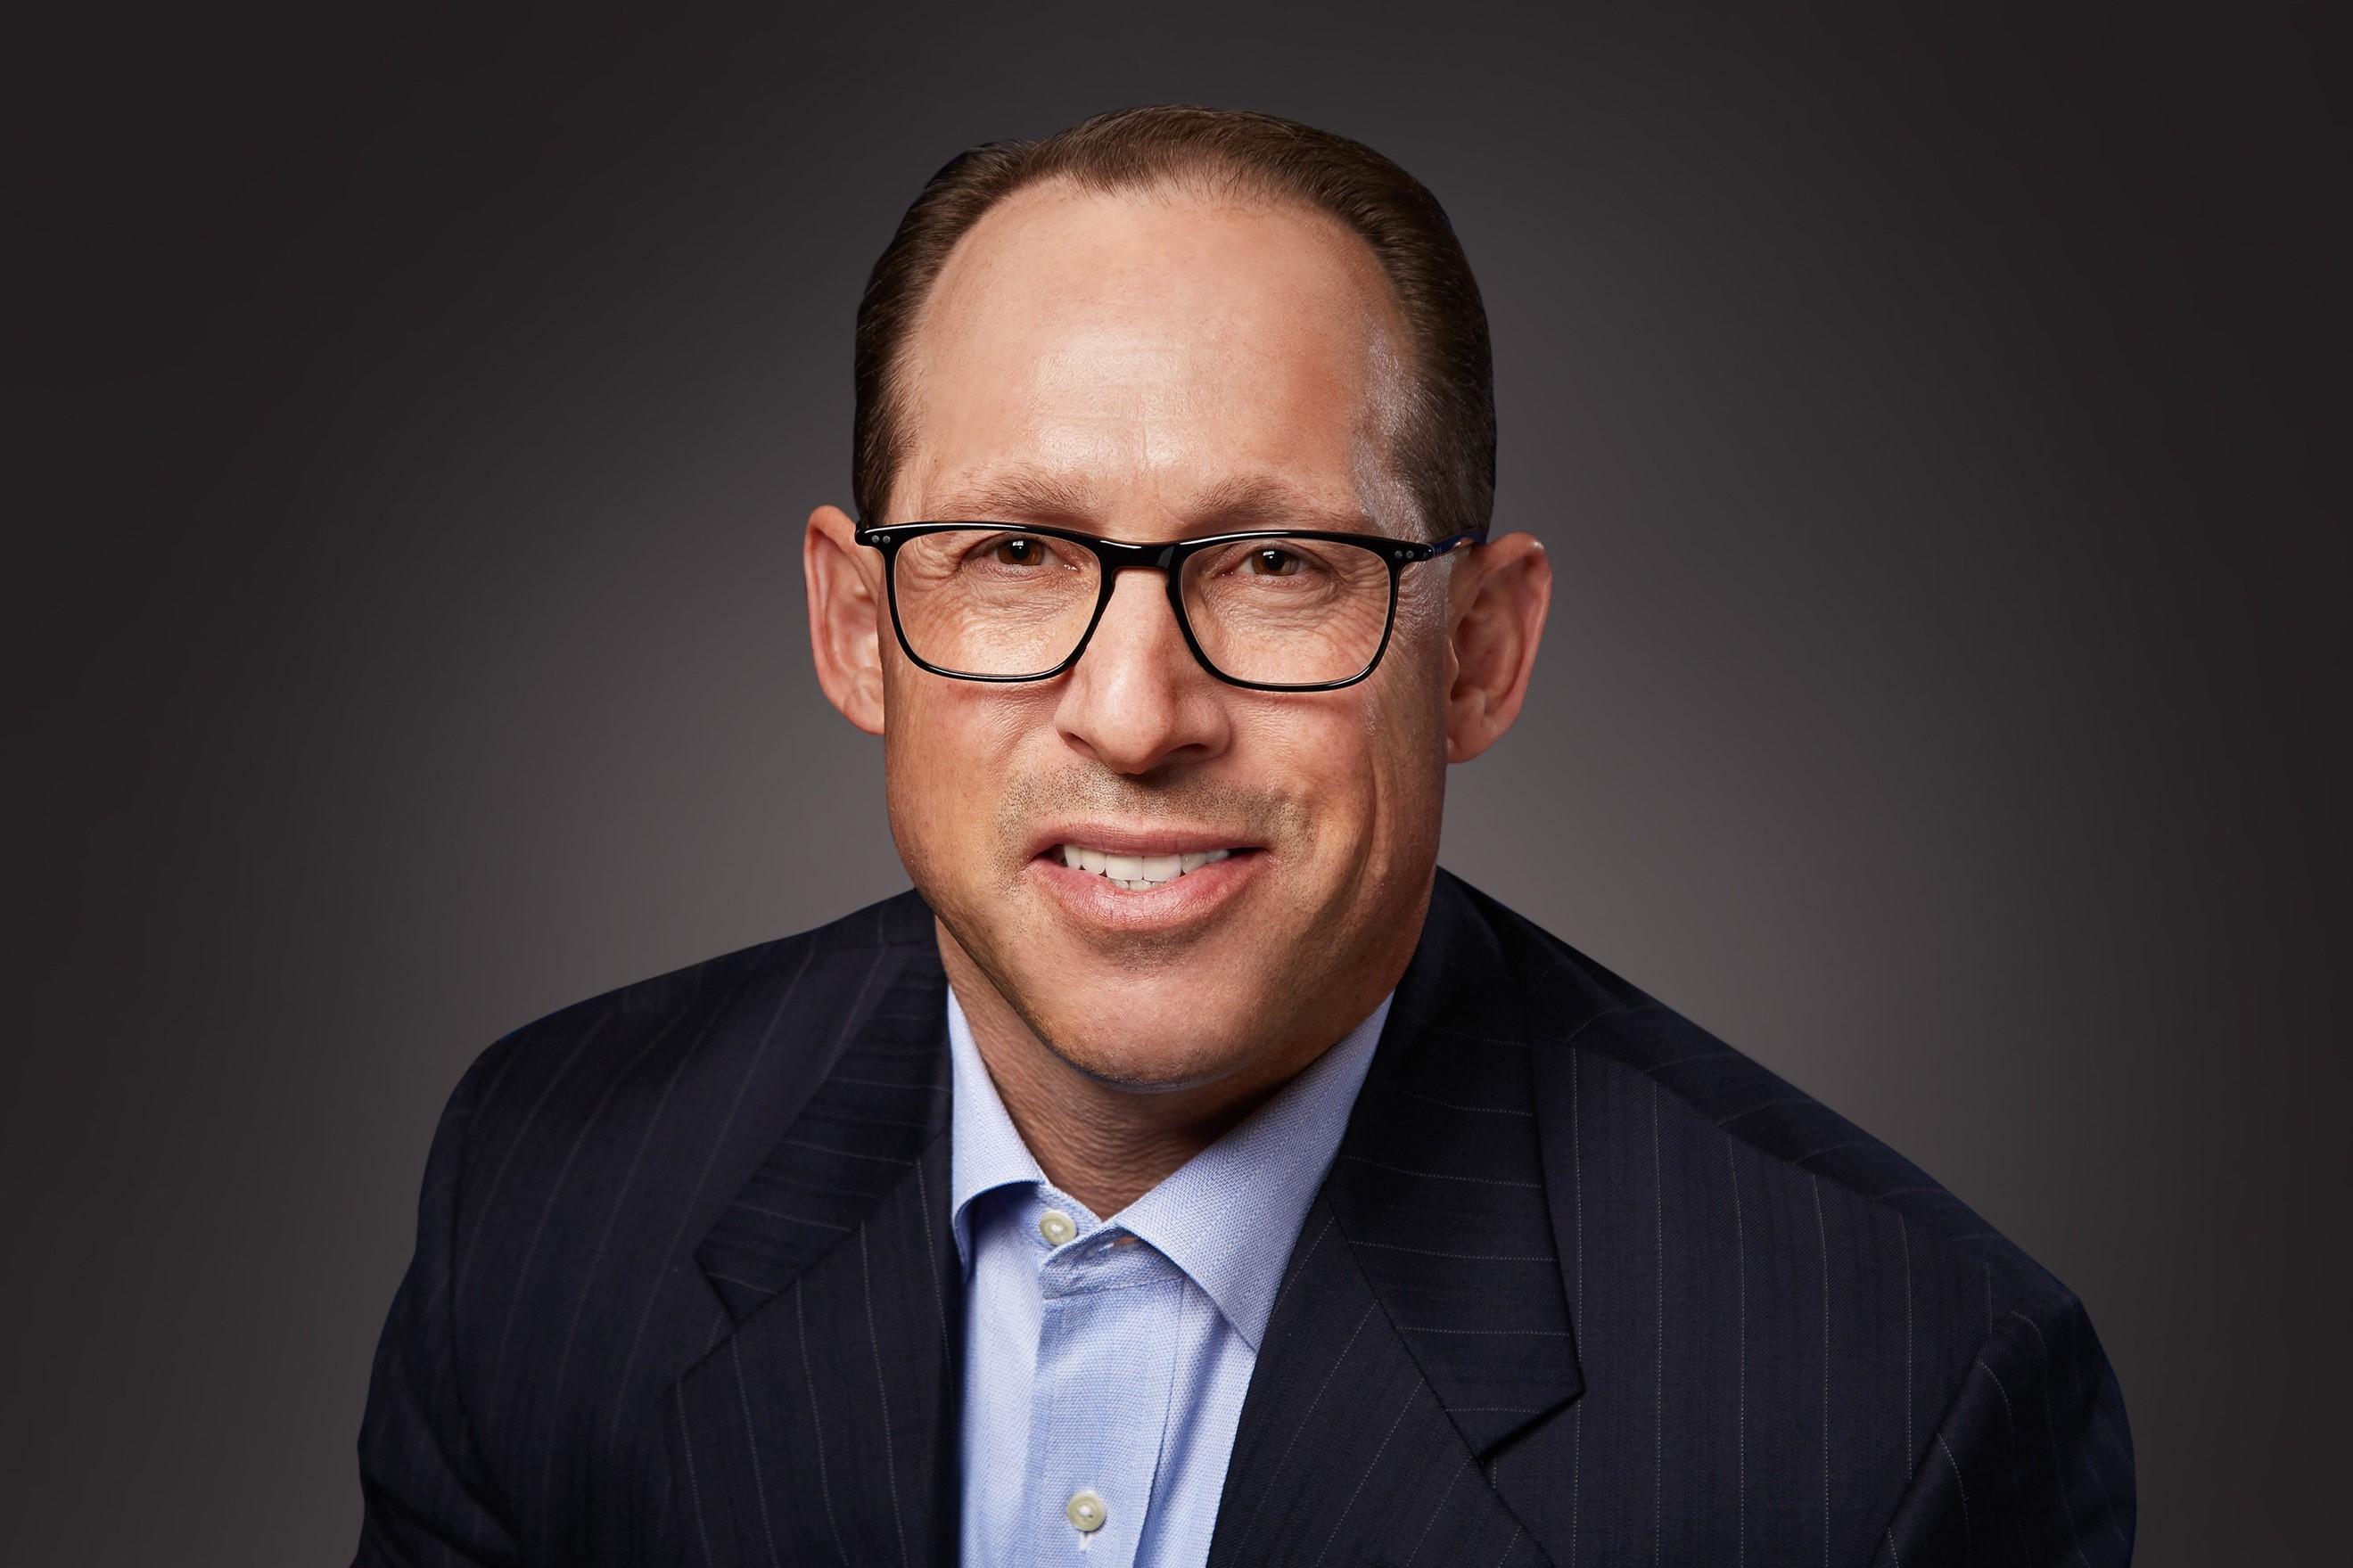 Glenn Lurie, CEO and president of Synchronoss